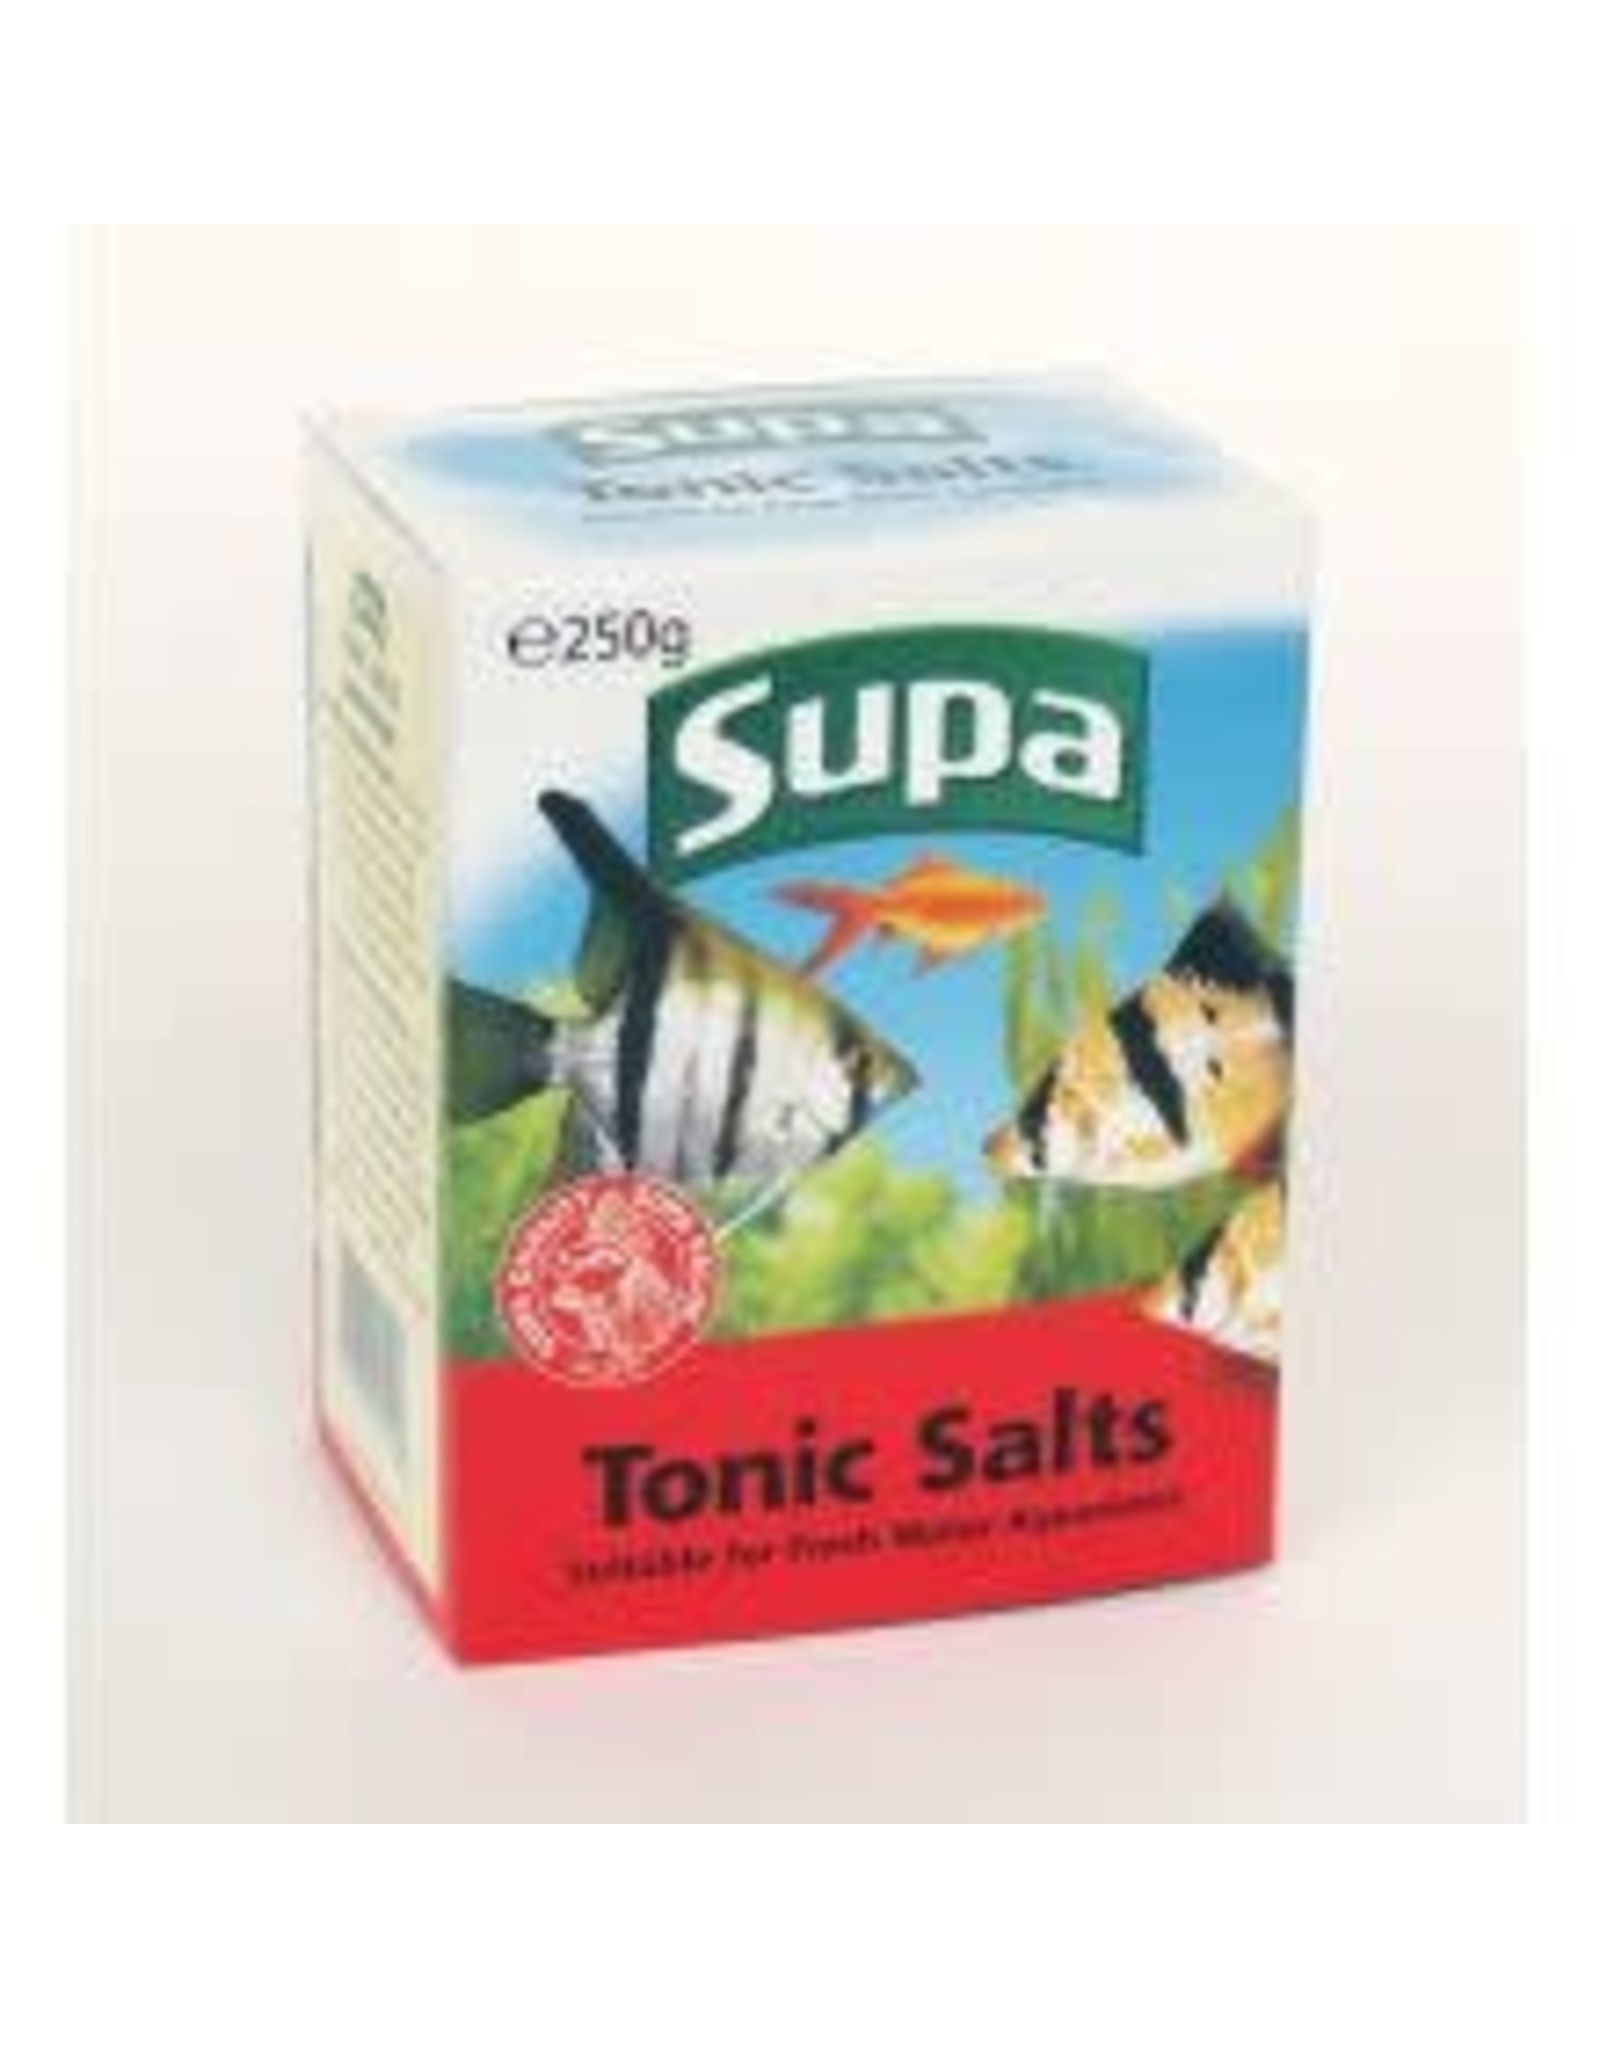 Supa Supa Aquarium Tonic Salts